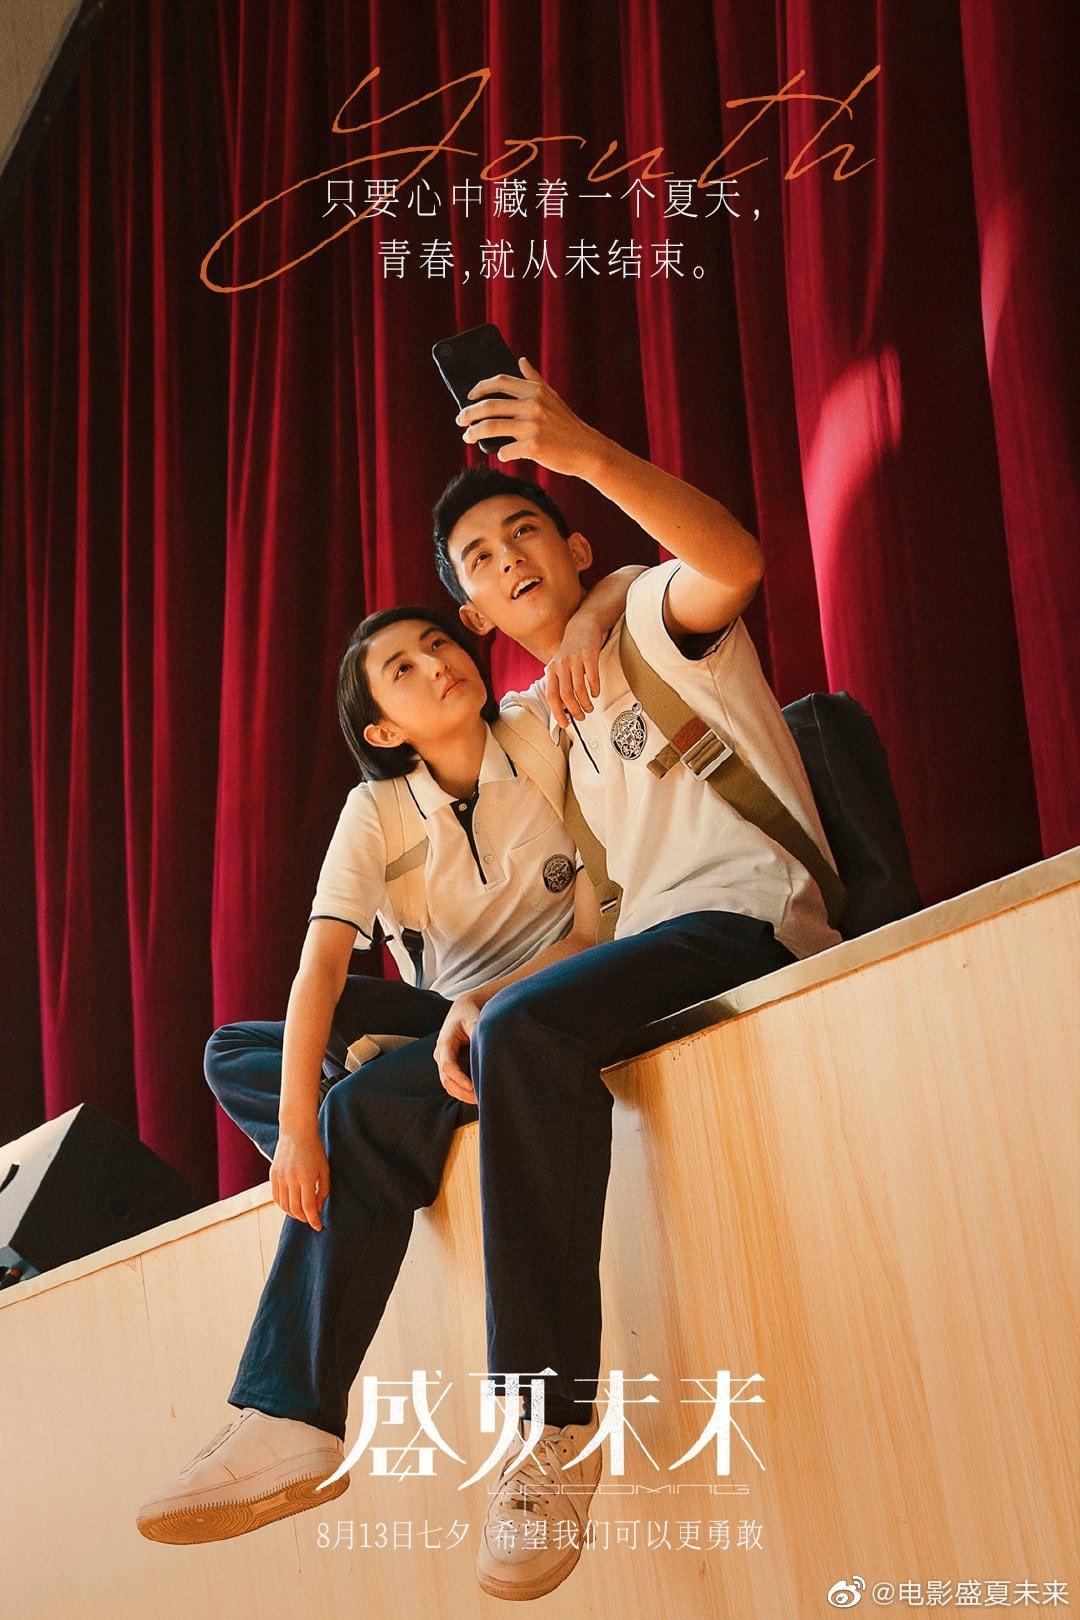 upcoming movie leo wu zhang zifeng 2